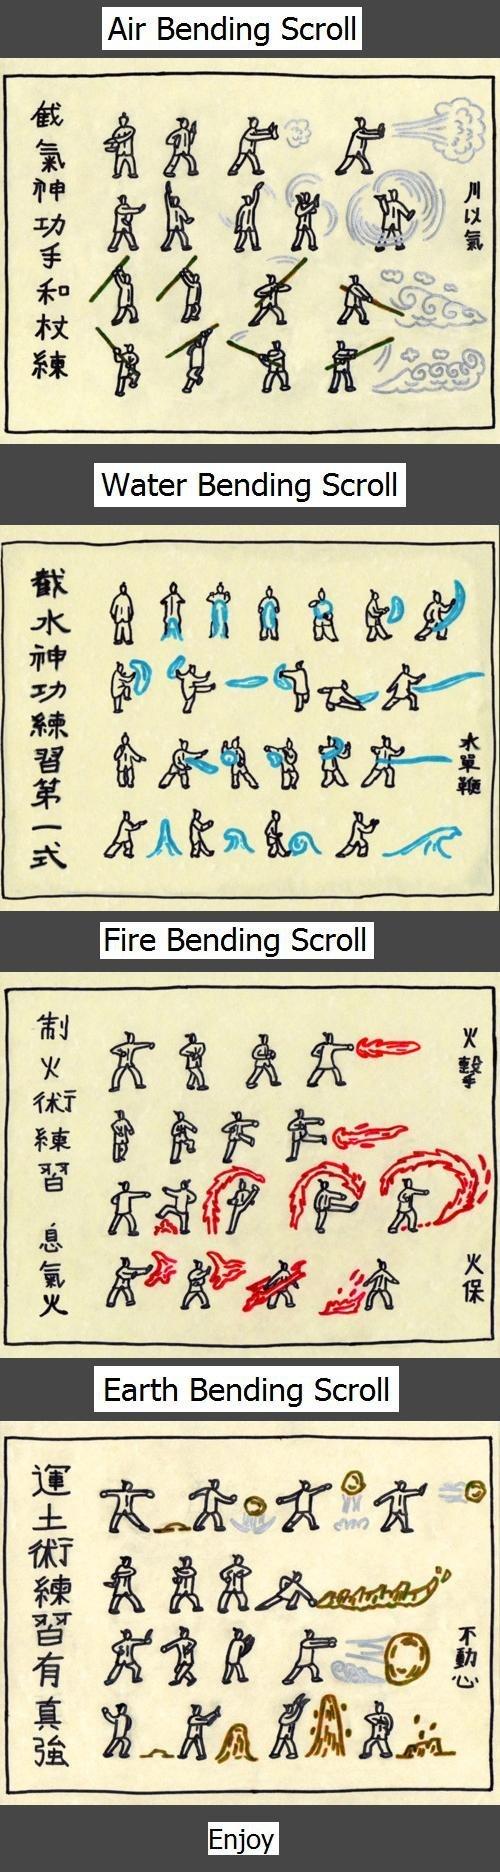 Aang (Character) - Comic Vine